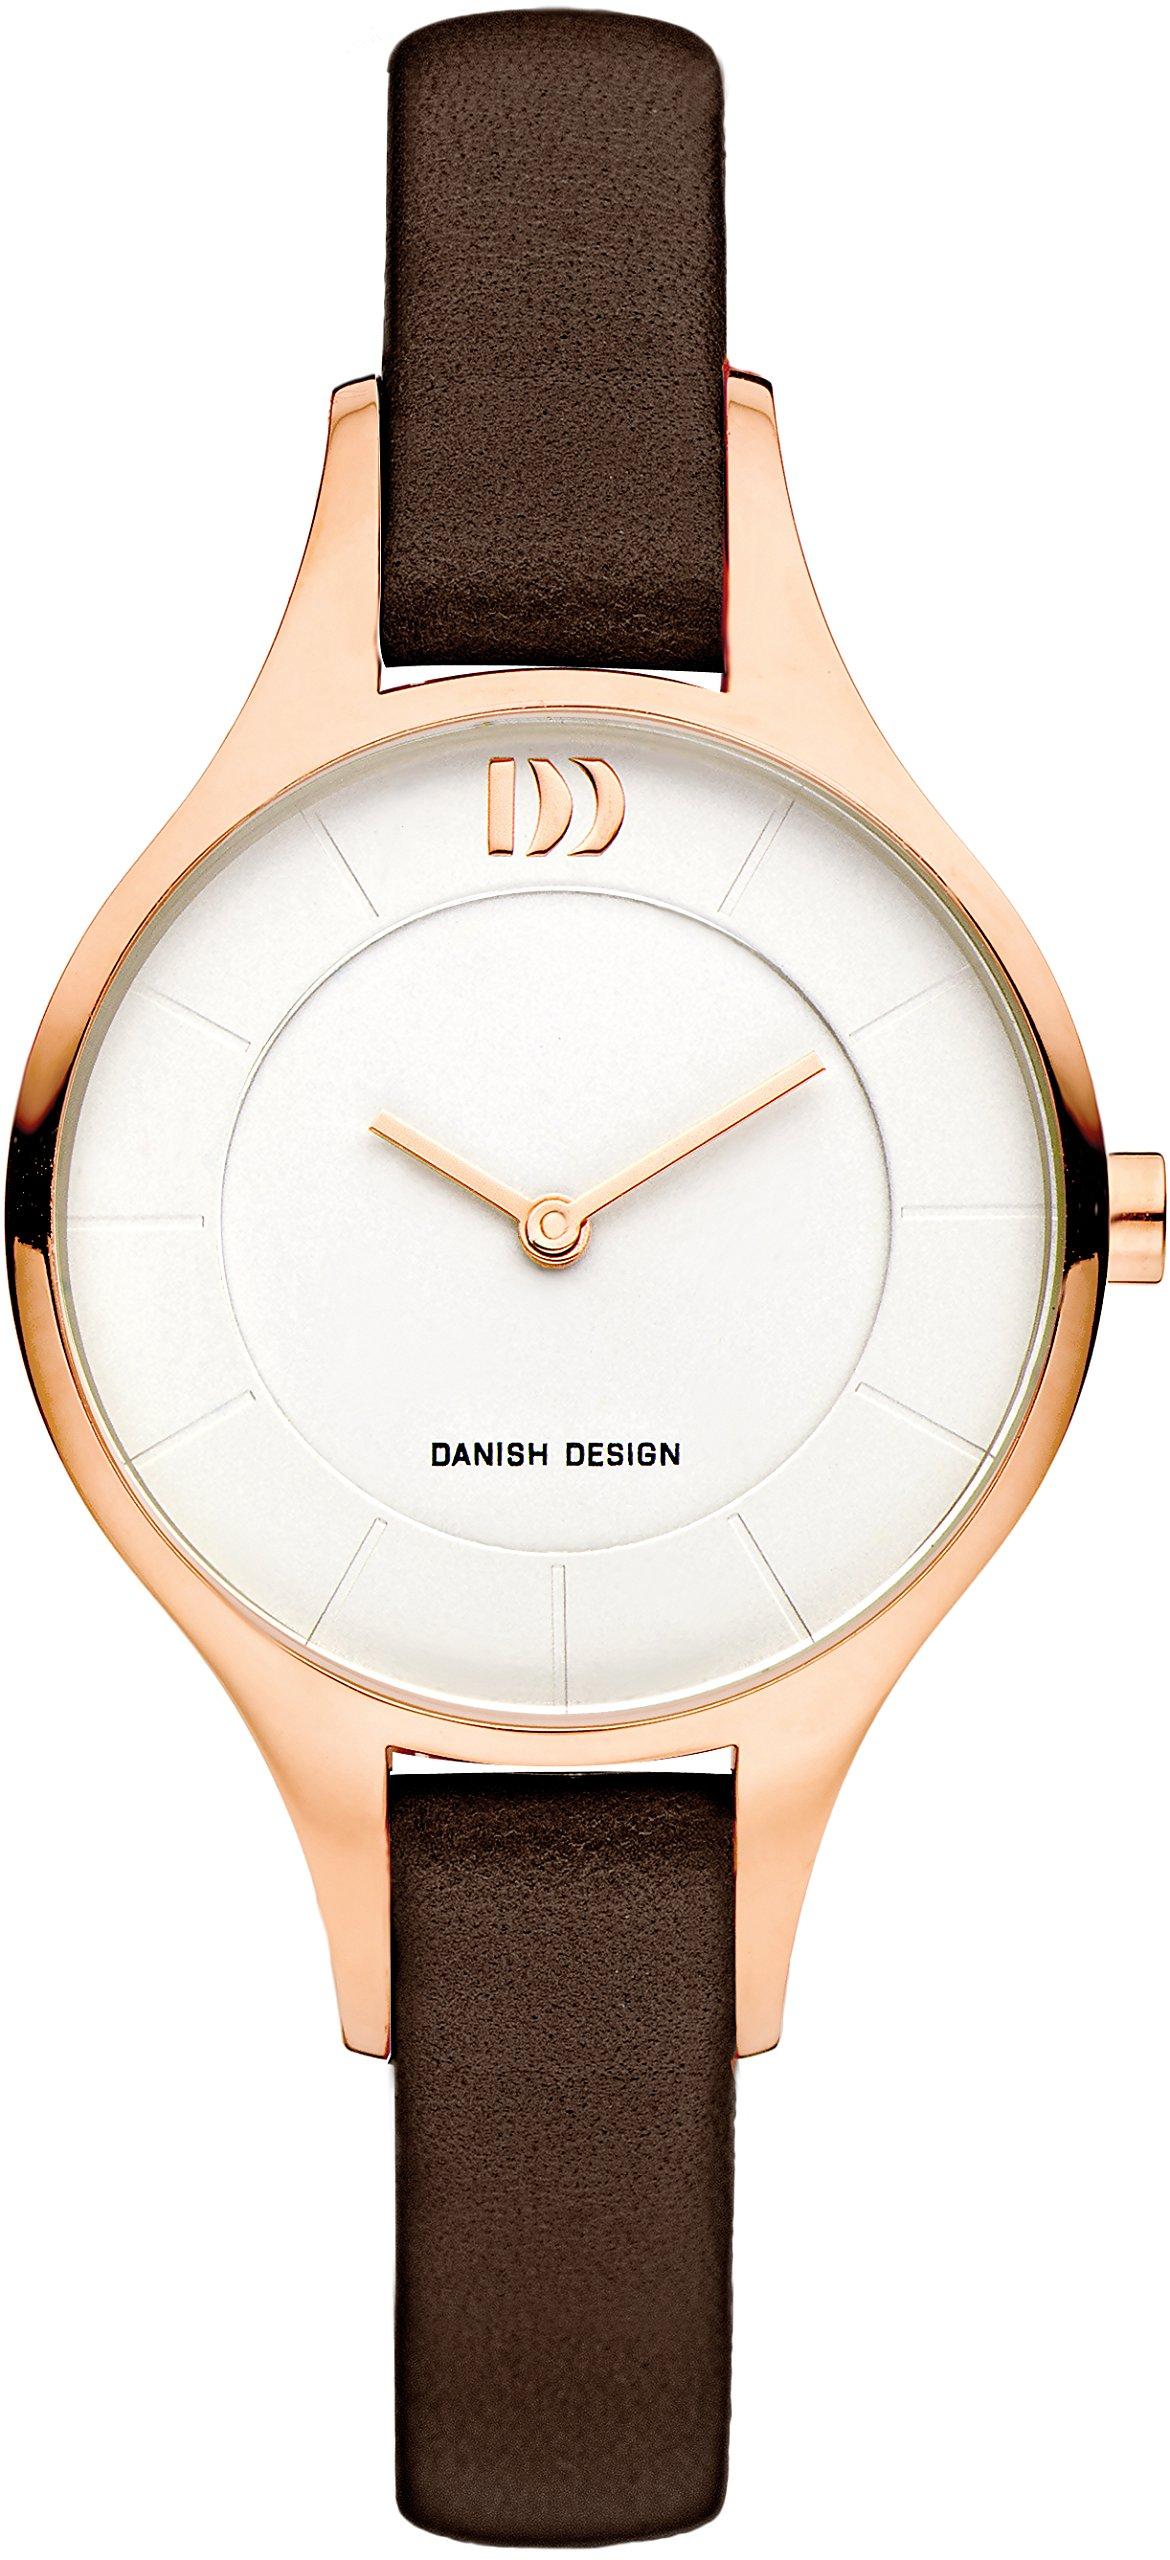 Danish-Design-Damen-Analog-Quarz-Uhr-mit-Leder-Armband-IV17Q1187